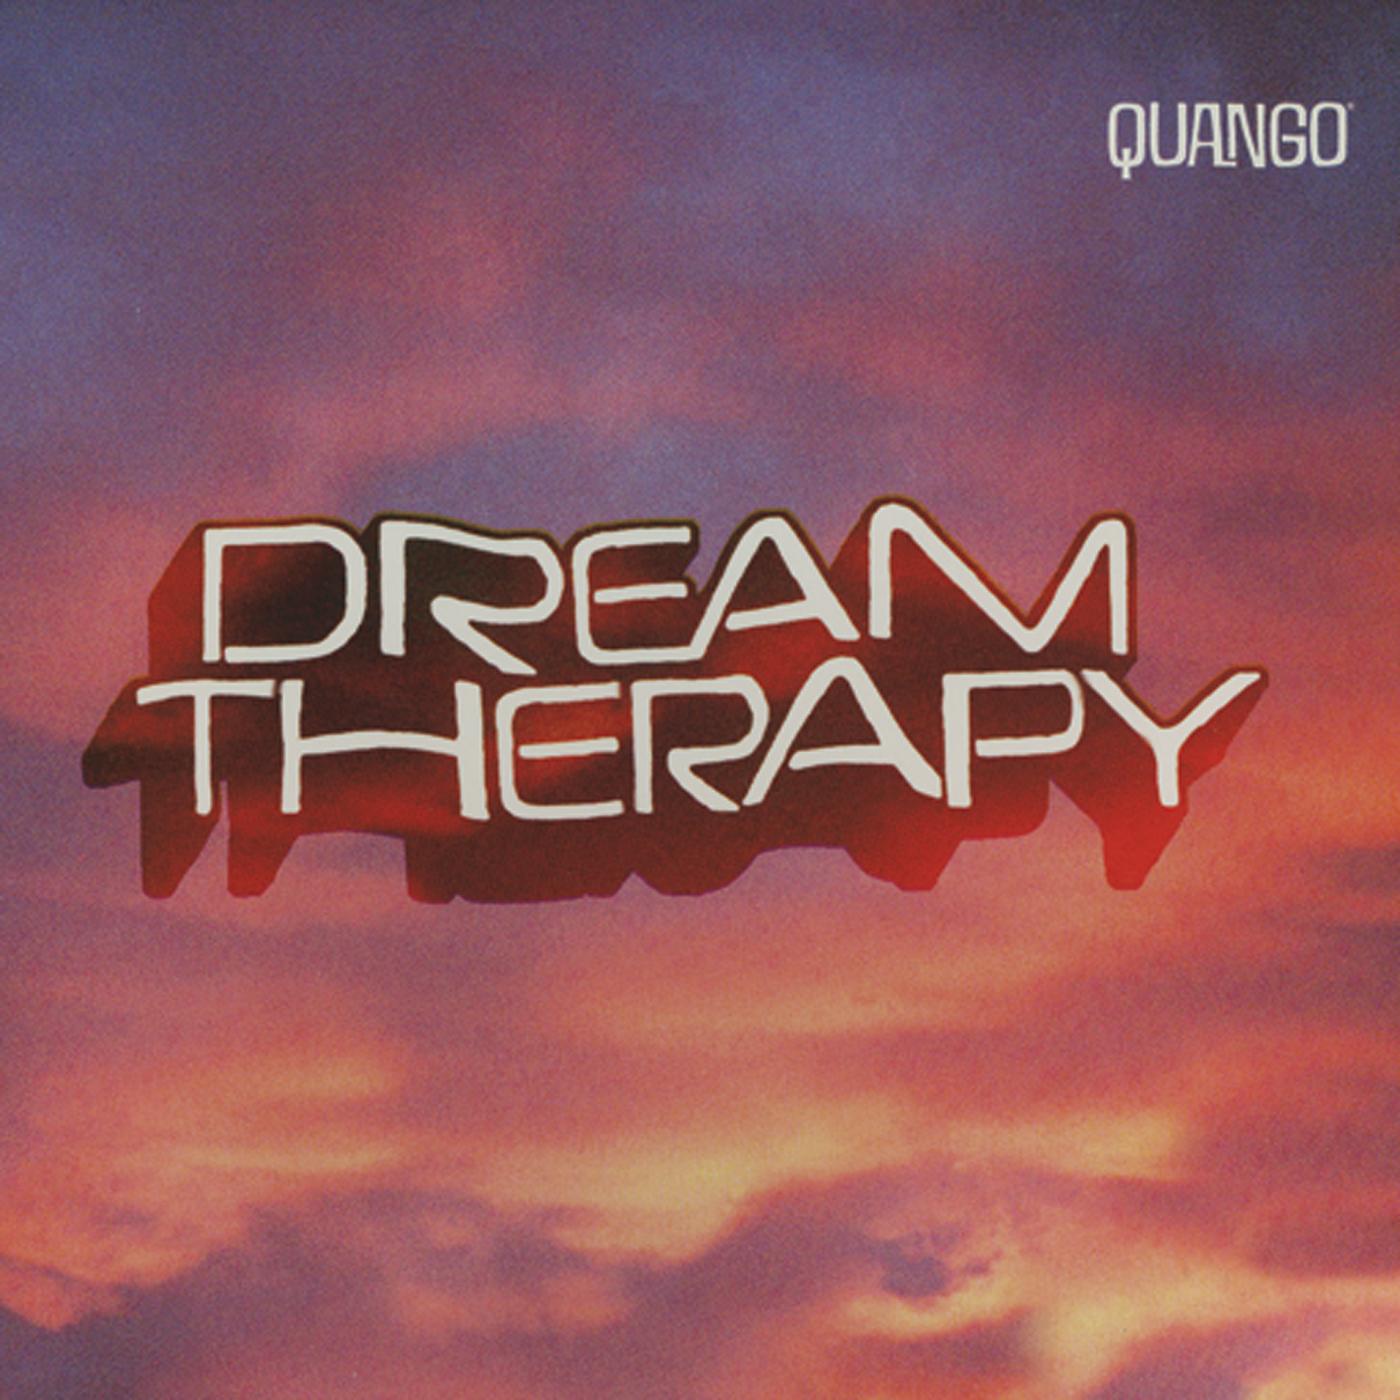 DreamTherapy.jpg